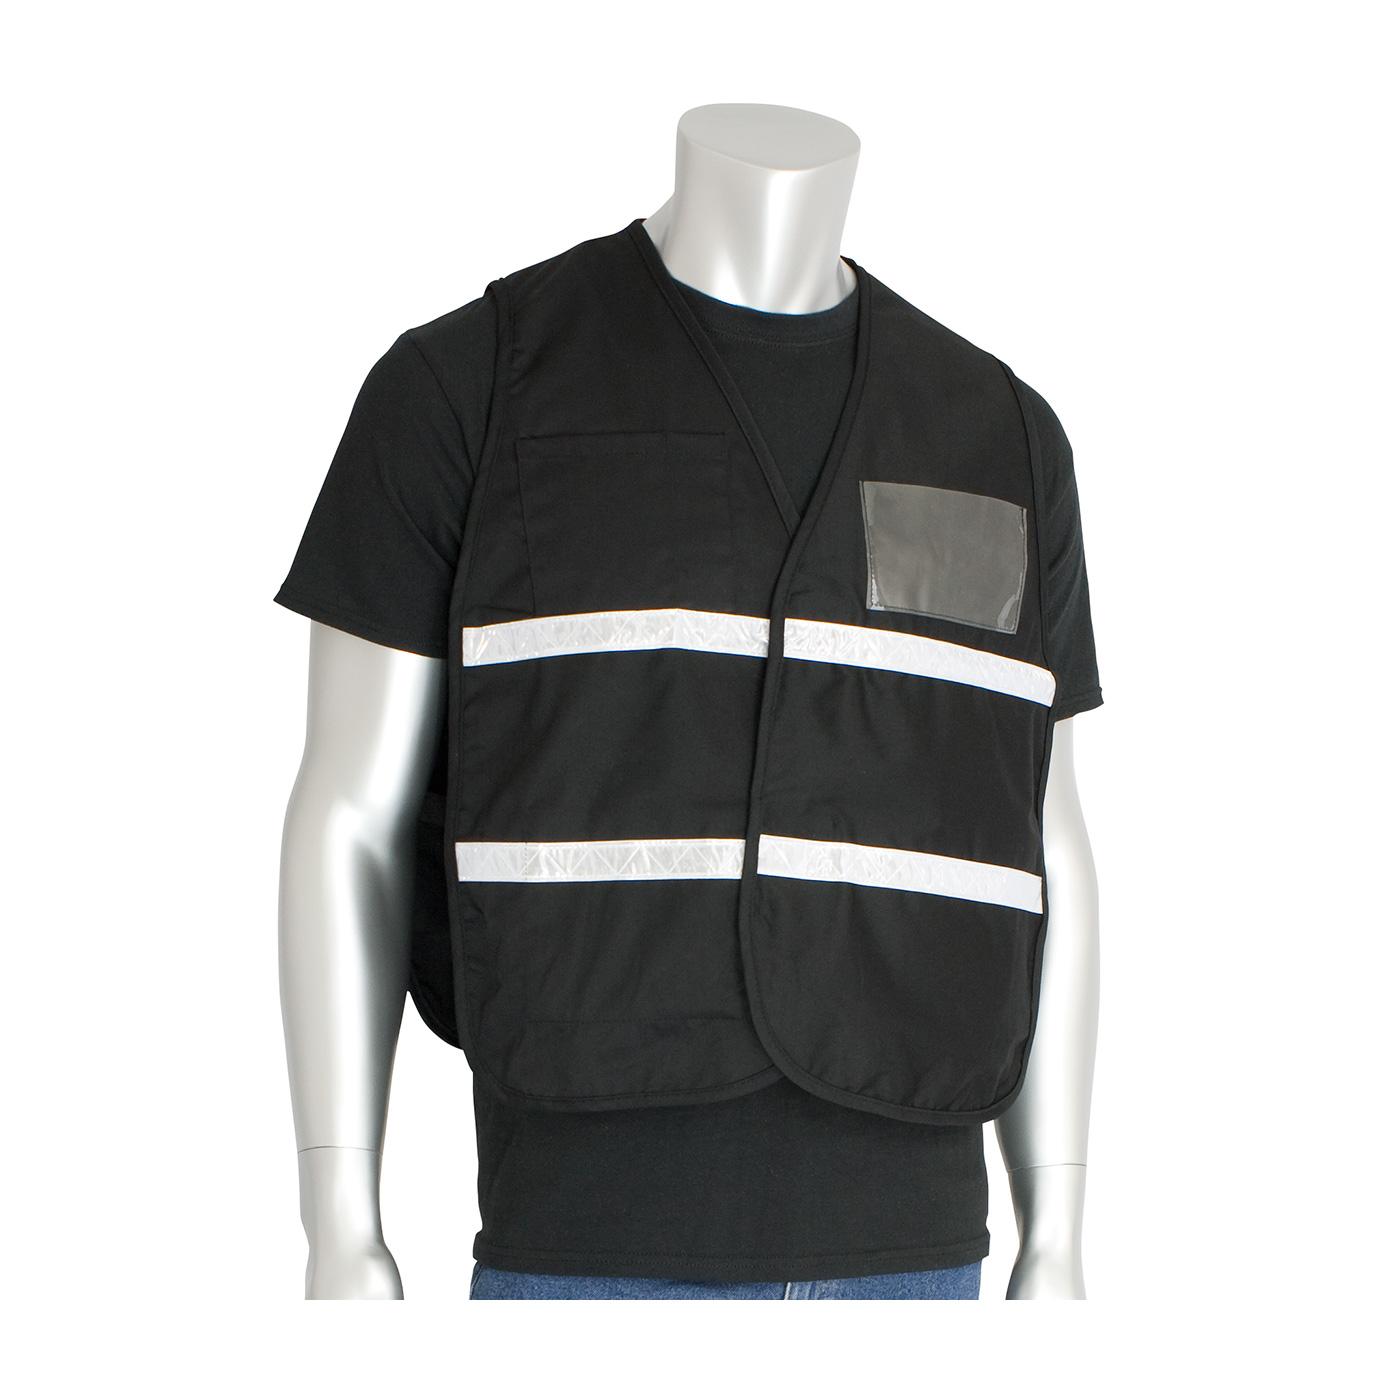 Non-ANSI Incident Command Vest - Cotton/Polyester Blend, Black, 4XL-5XL